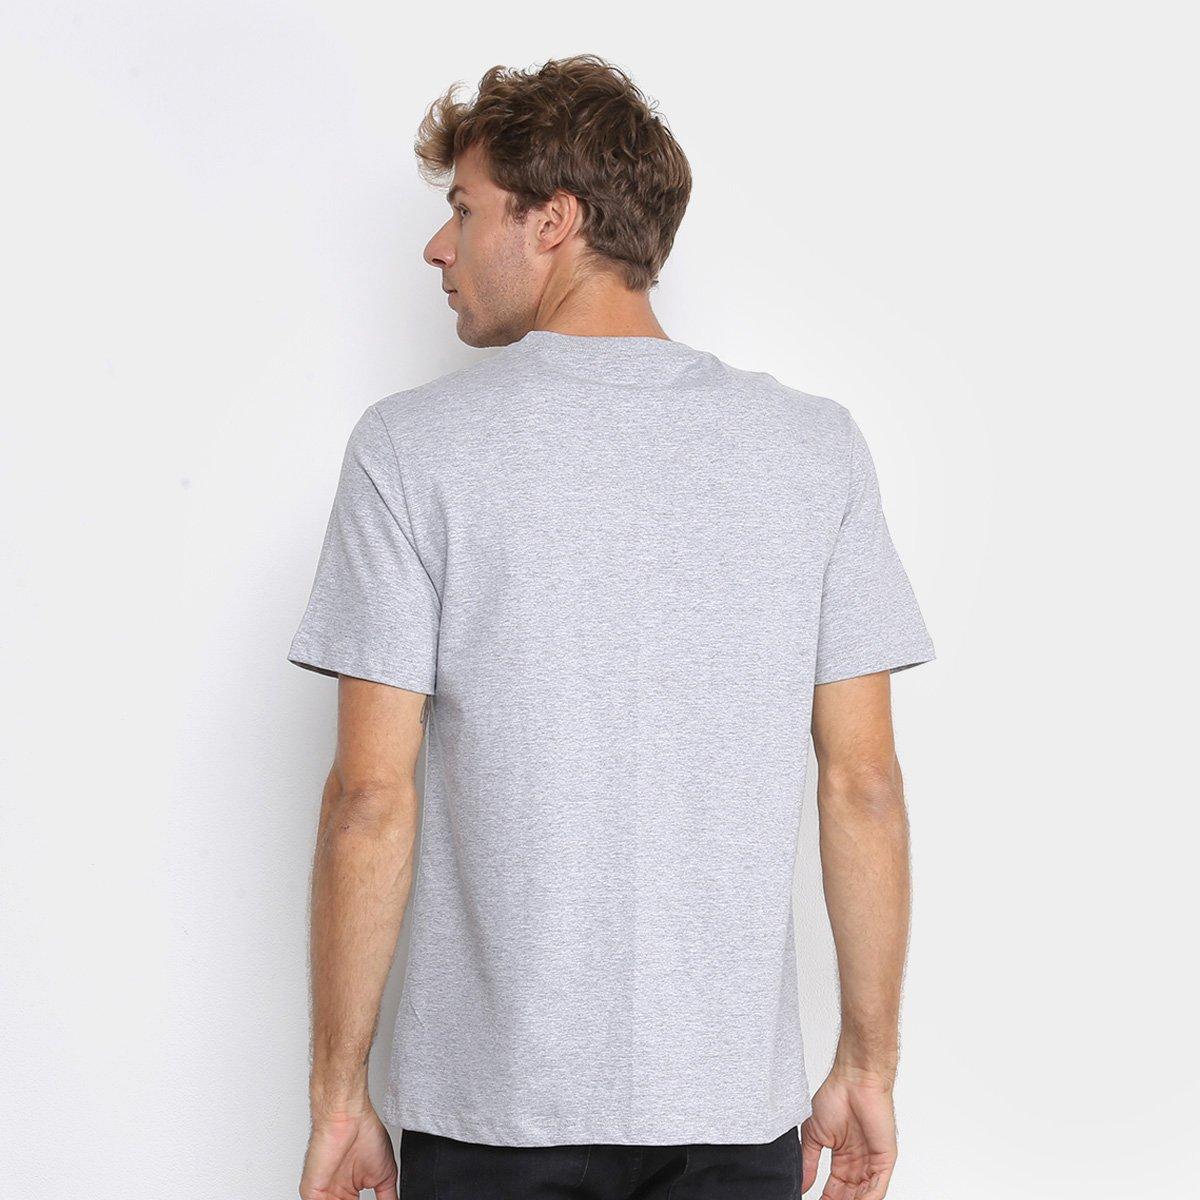 Camiseta Cavalera Mininja Masculina - Mescla